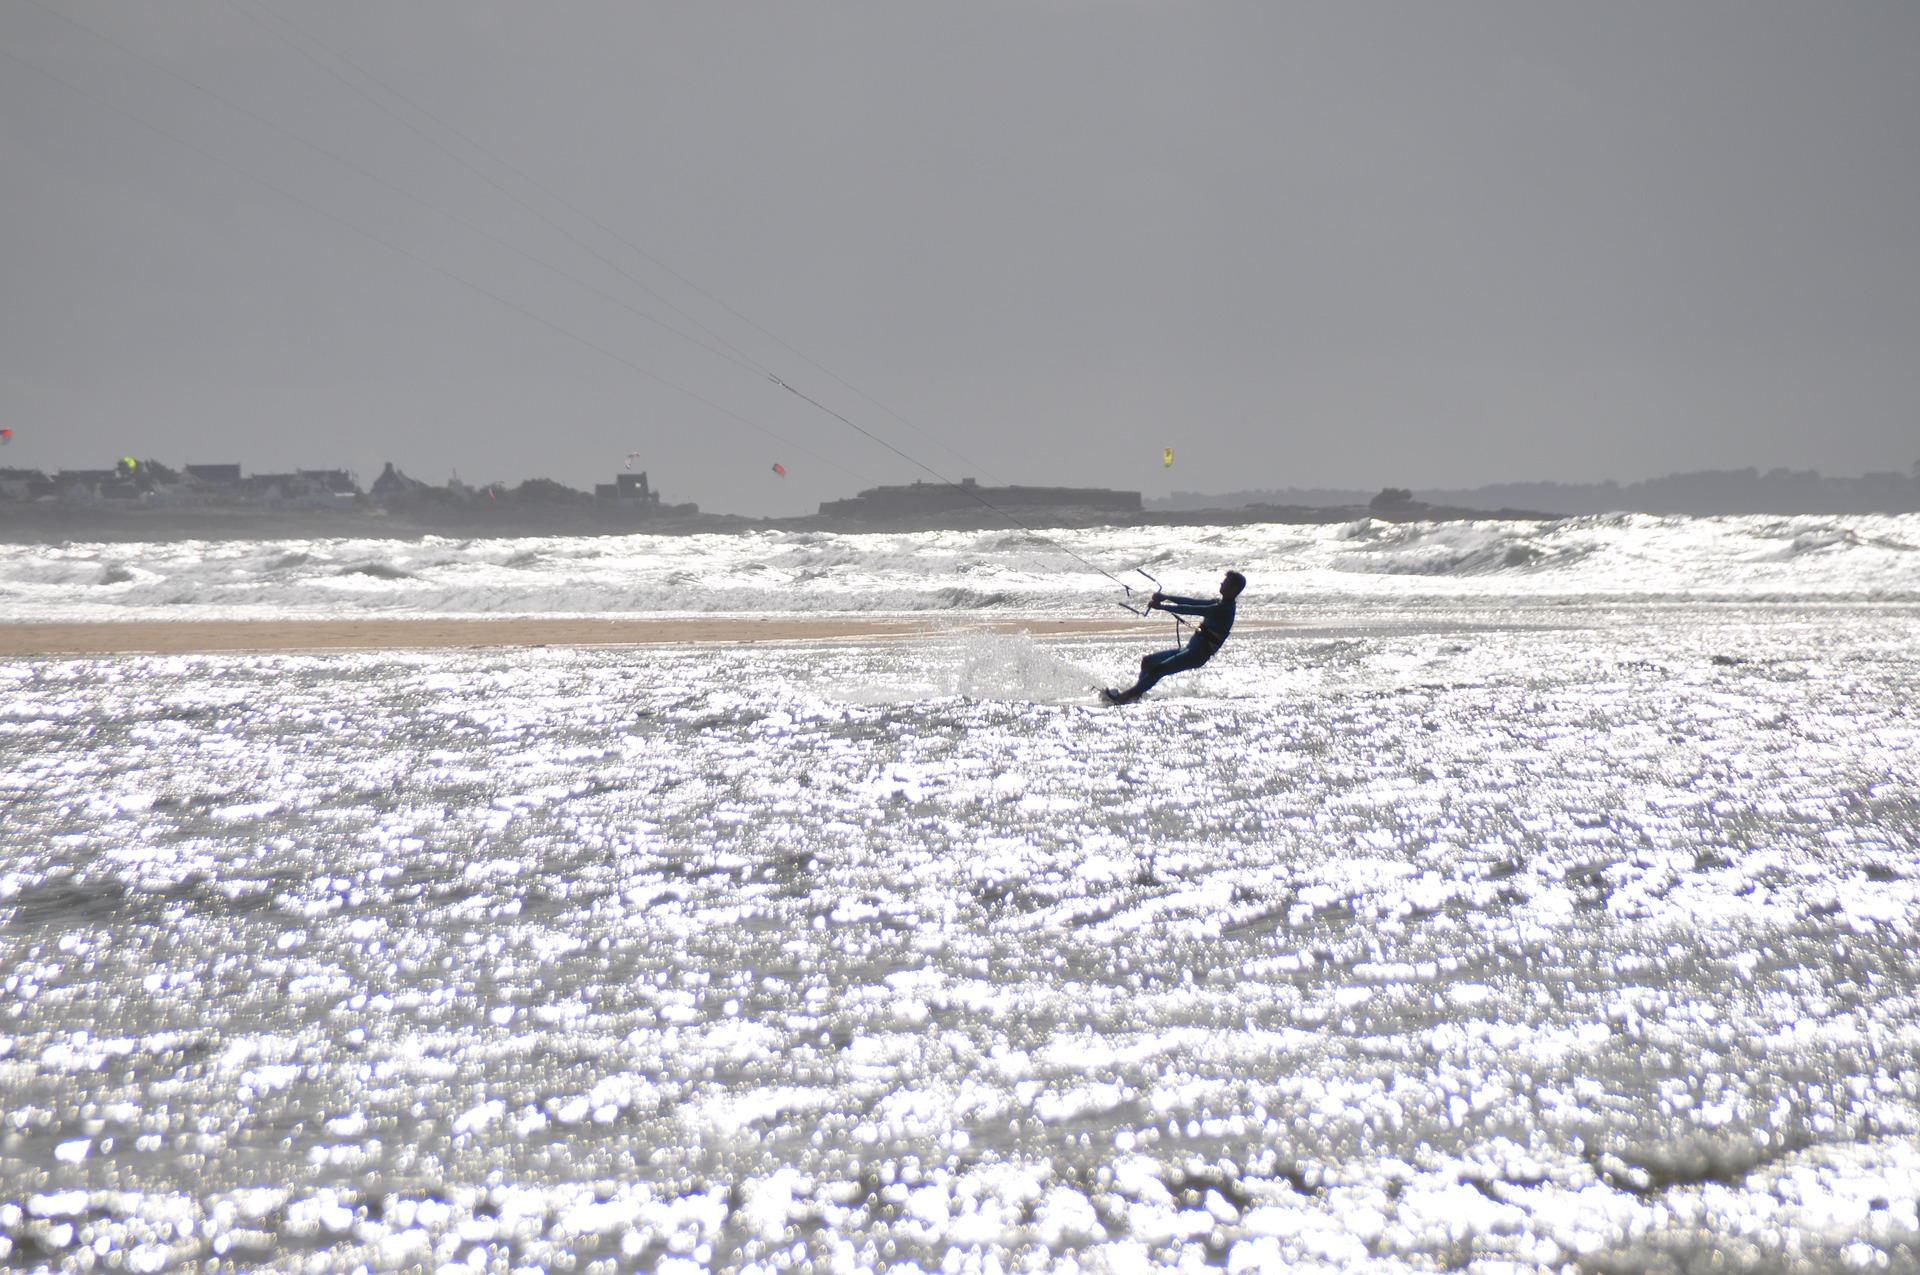 kitesurf - sucesso nesse esporte.